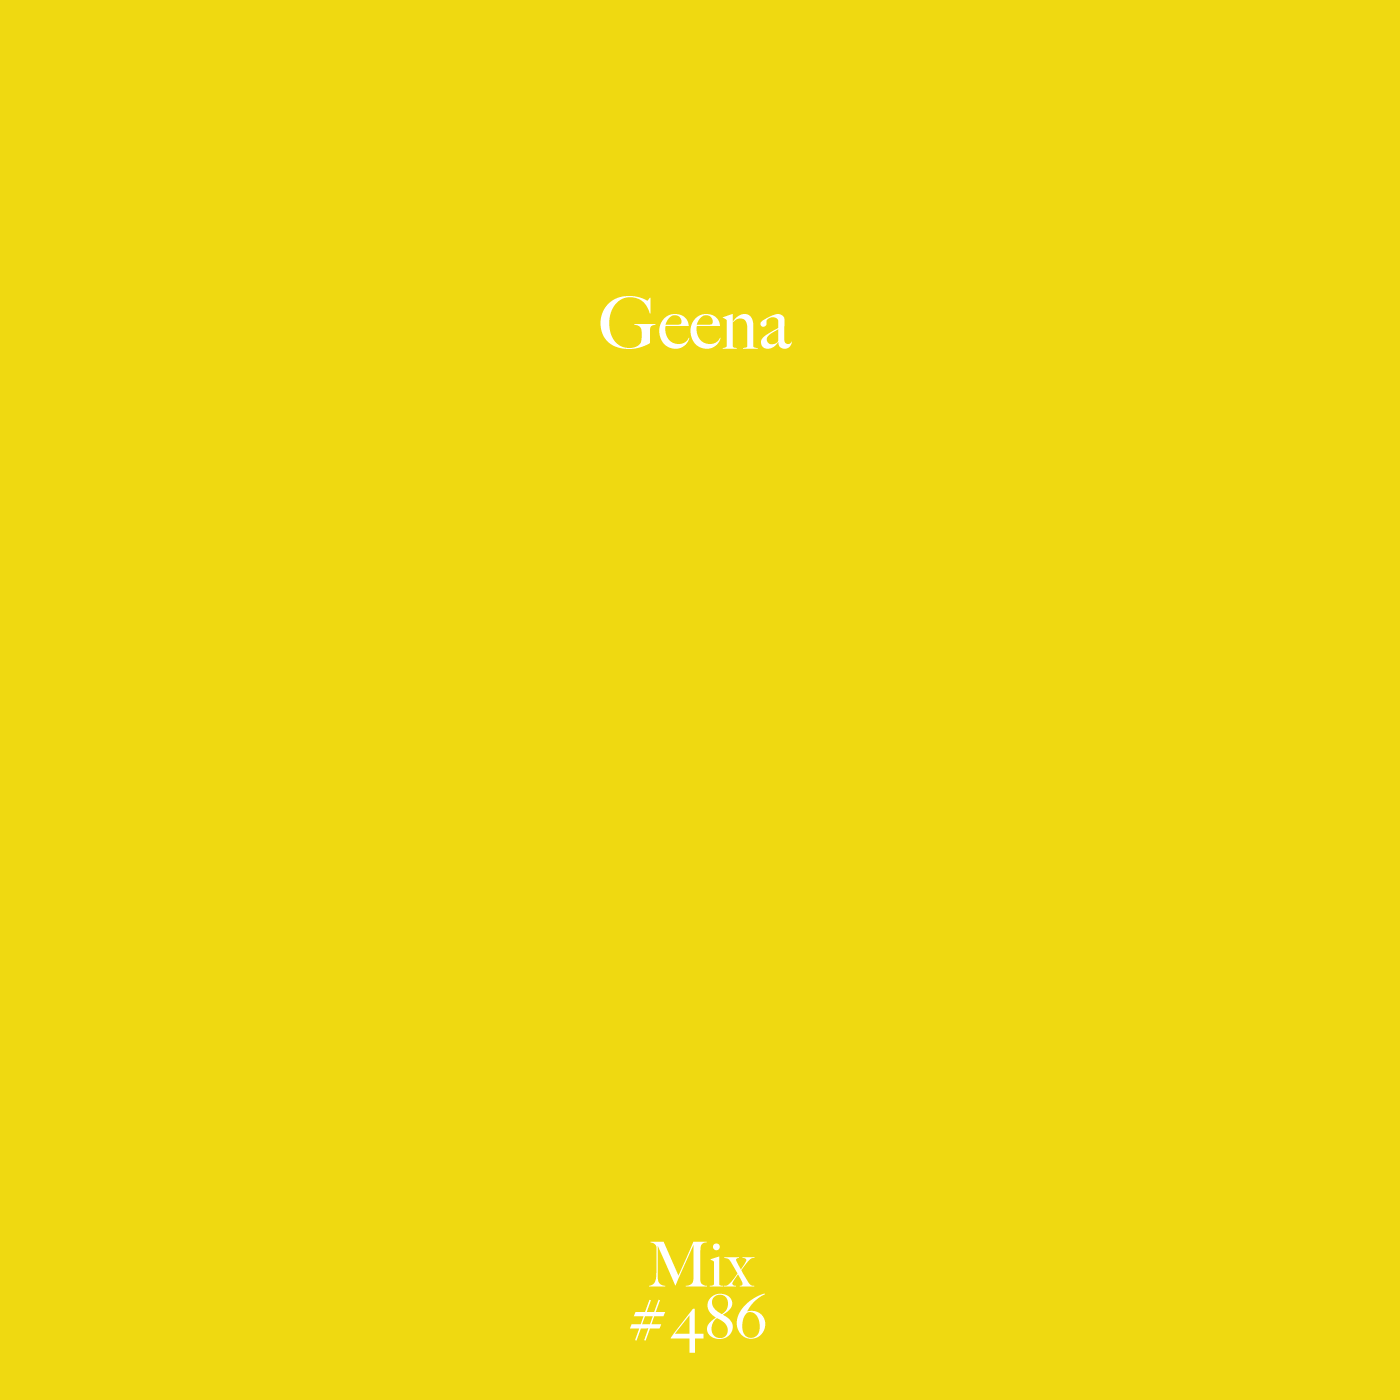 Geena, Worldwide Zen, Mix, Test Pressing, House, Dub, Styles